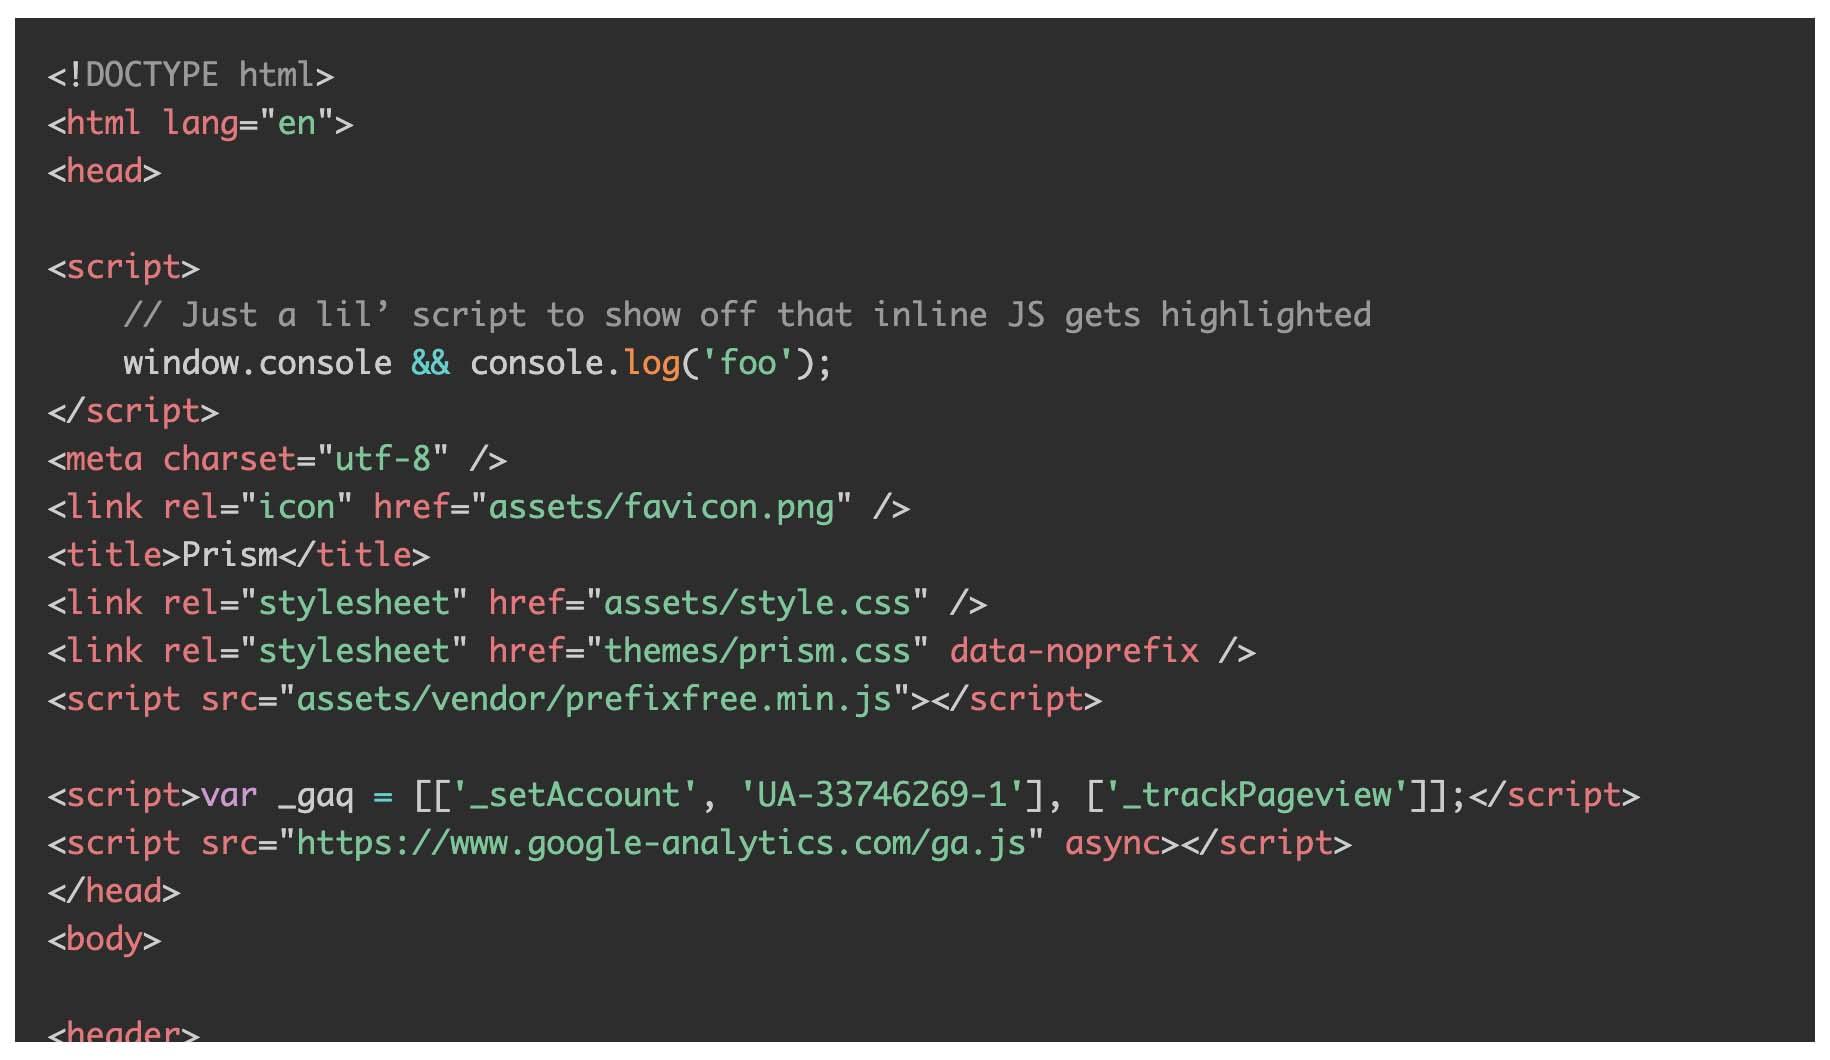 Prism.jsでTomorrow Nightのテーマを選択した際のコード表示